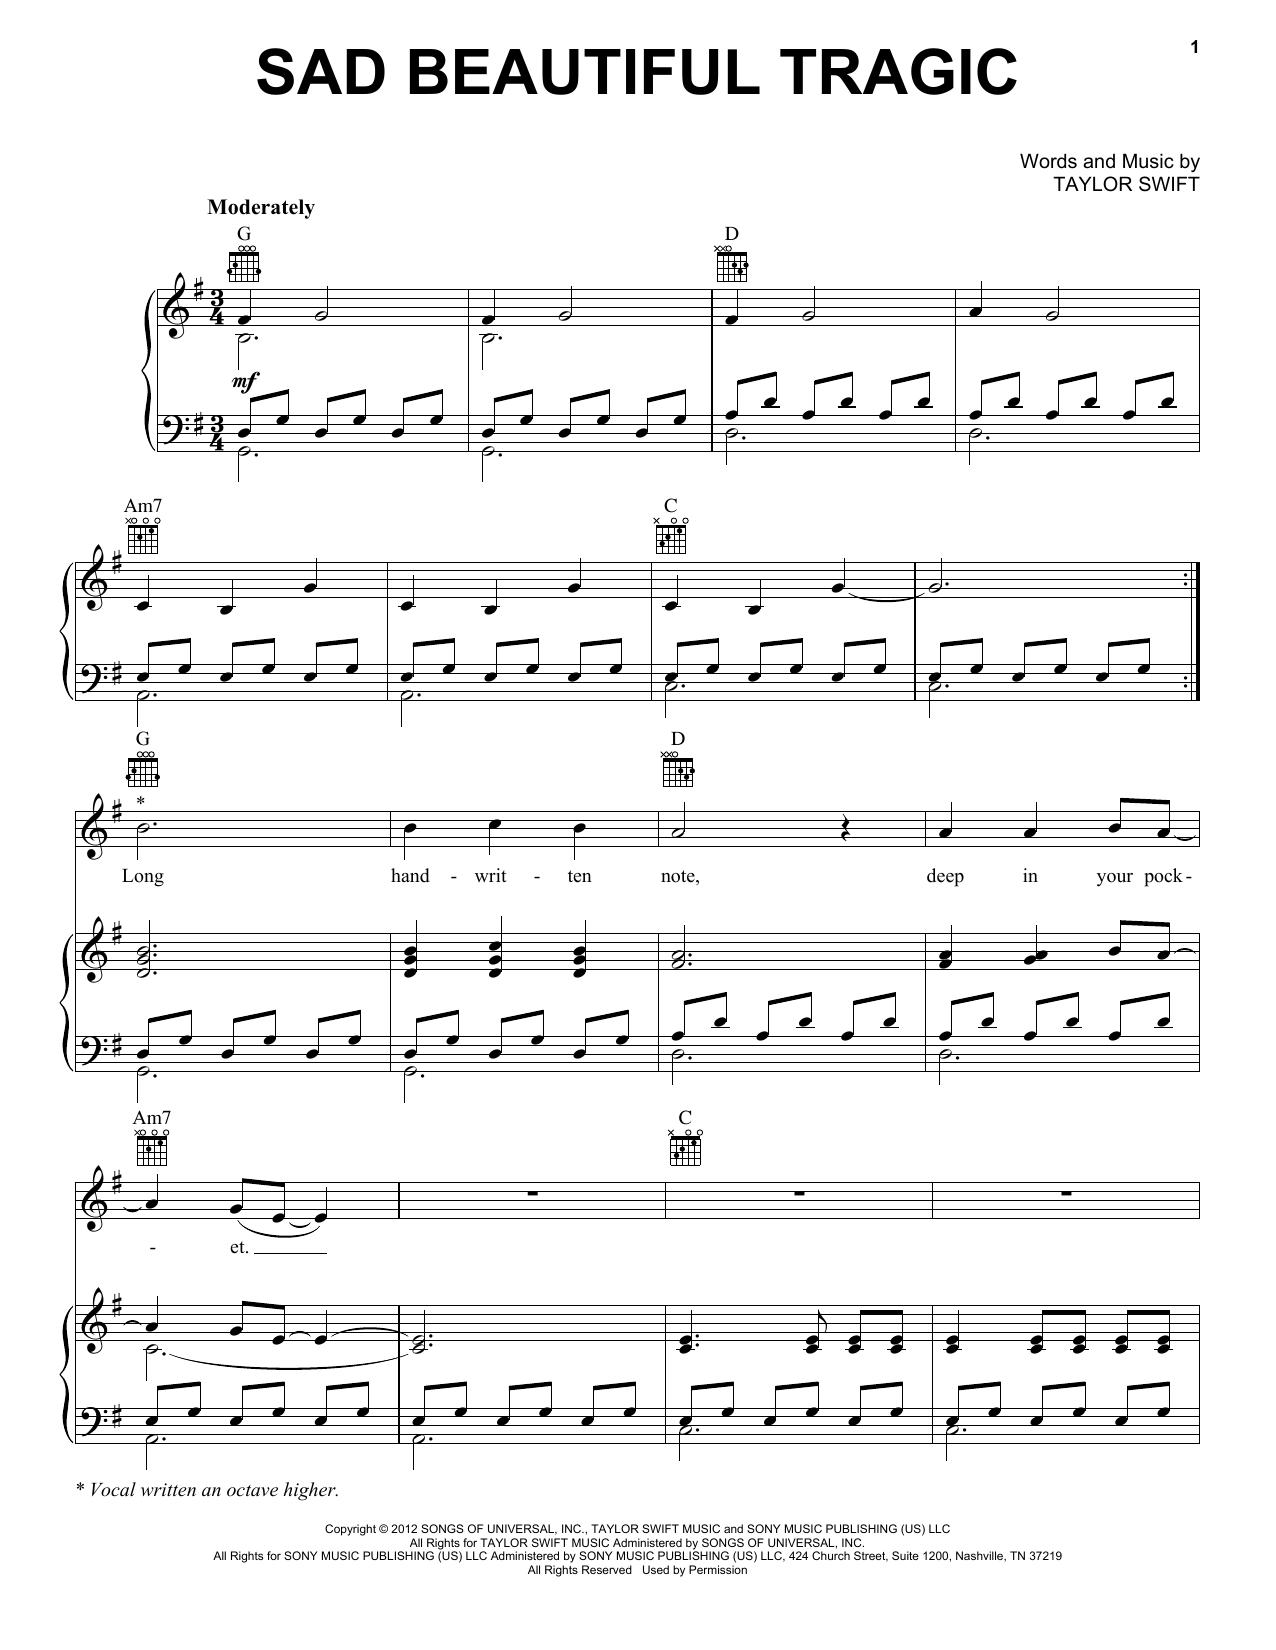 Sad Beautiful Tragic sheet music by Taylor Swift (Piano, Vocal u0026 Guitar (Right-Hand Melody) u2013 93905)